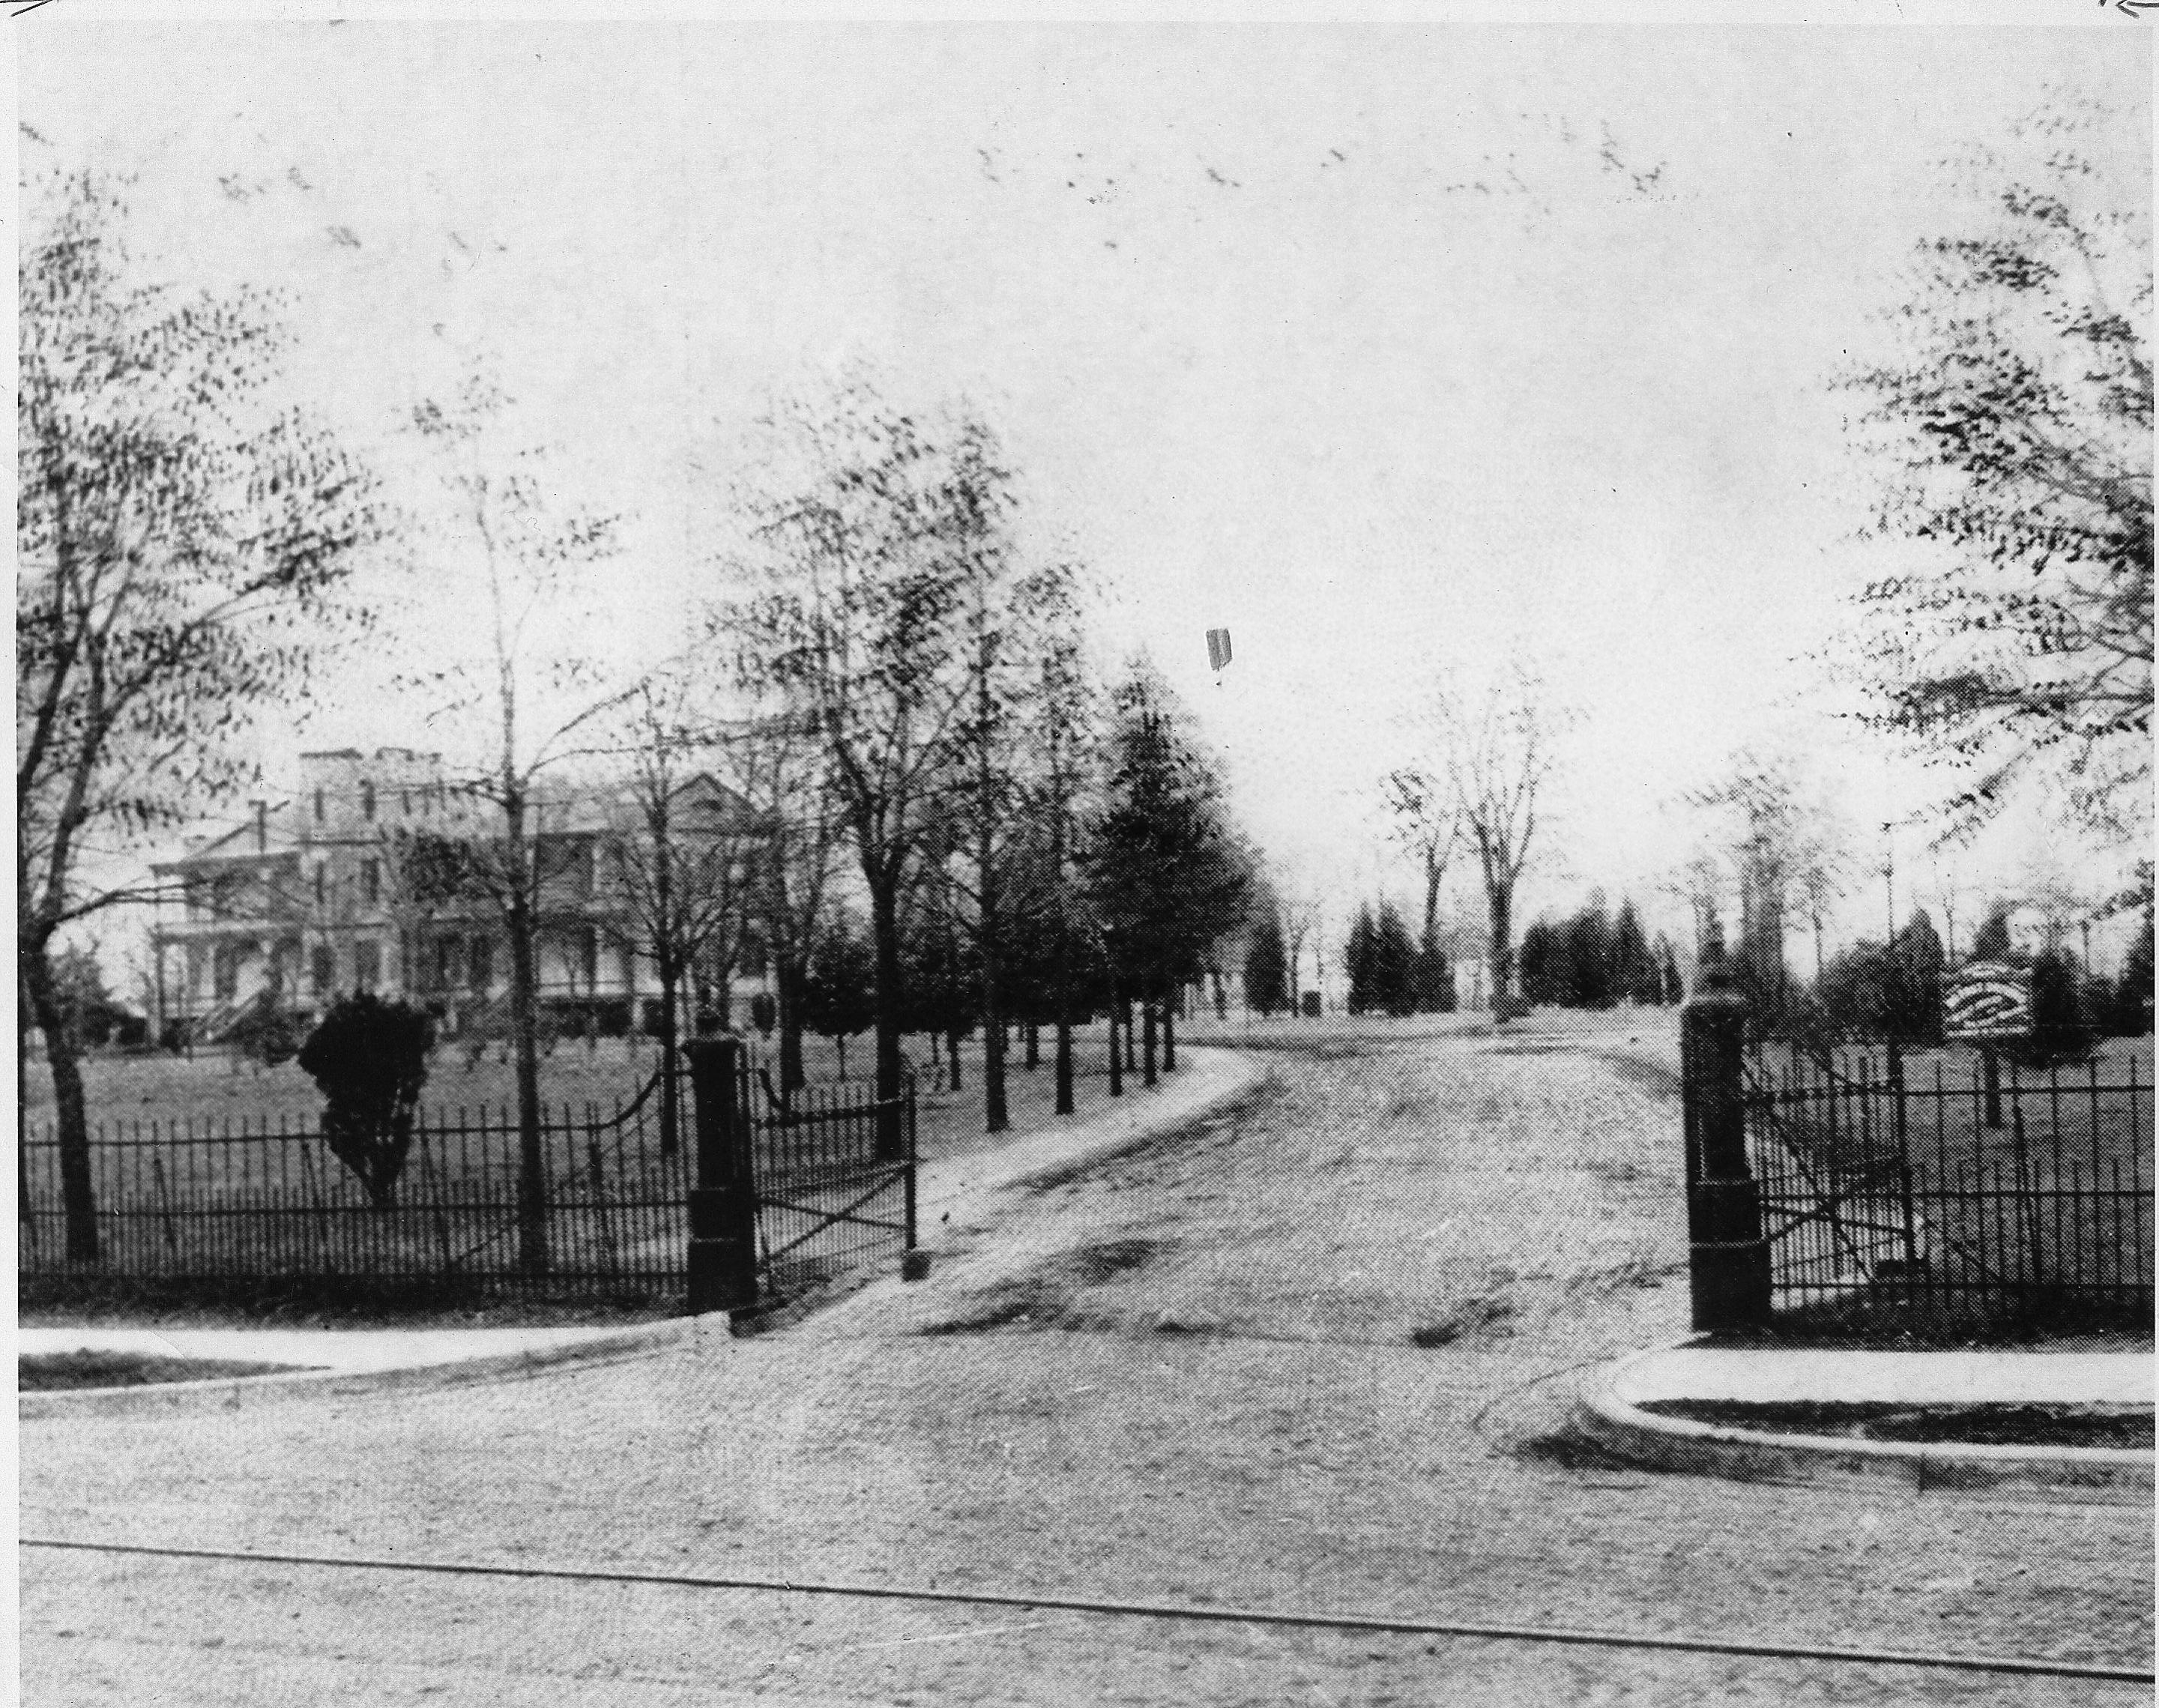 macarthur park entrance, 1900